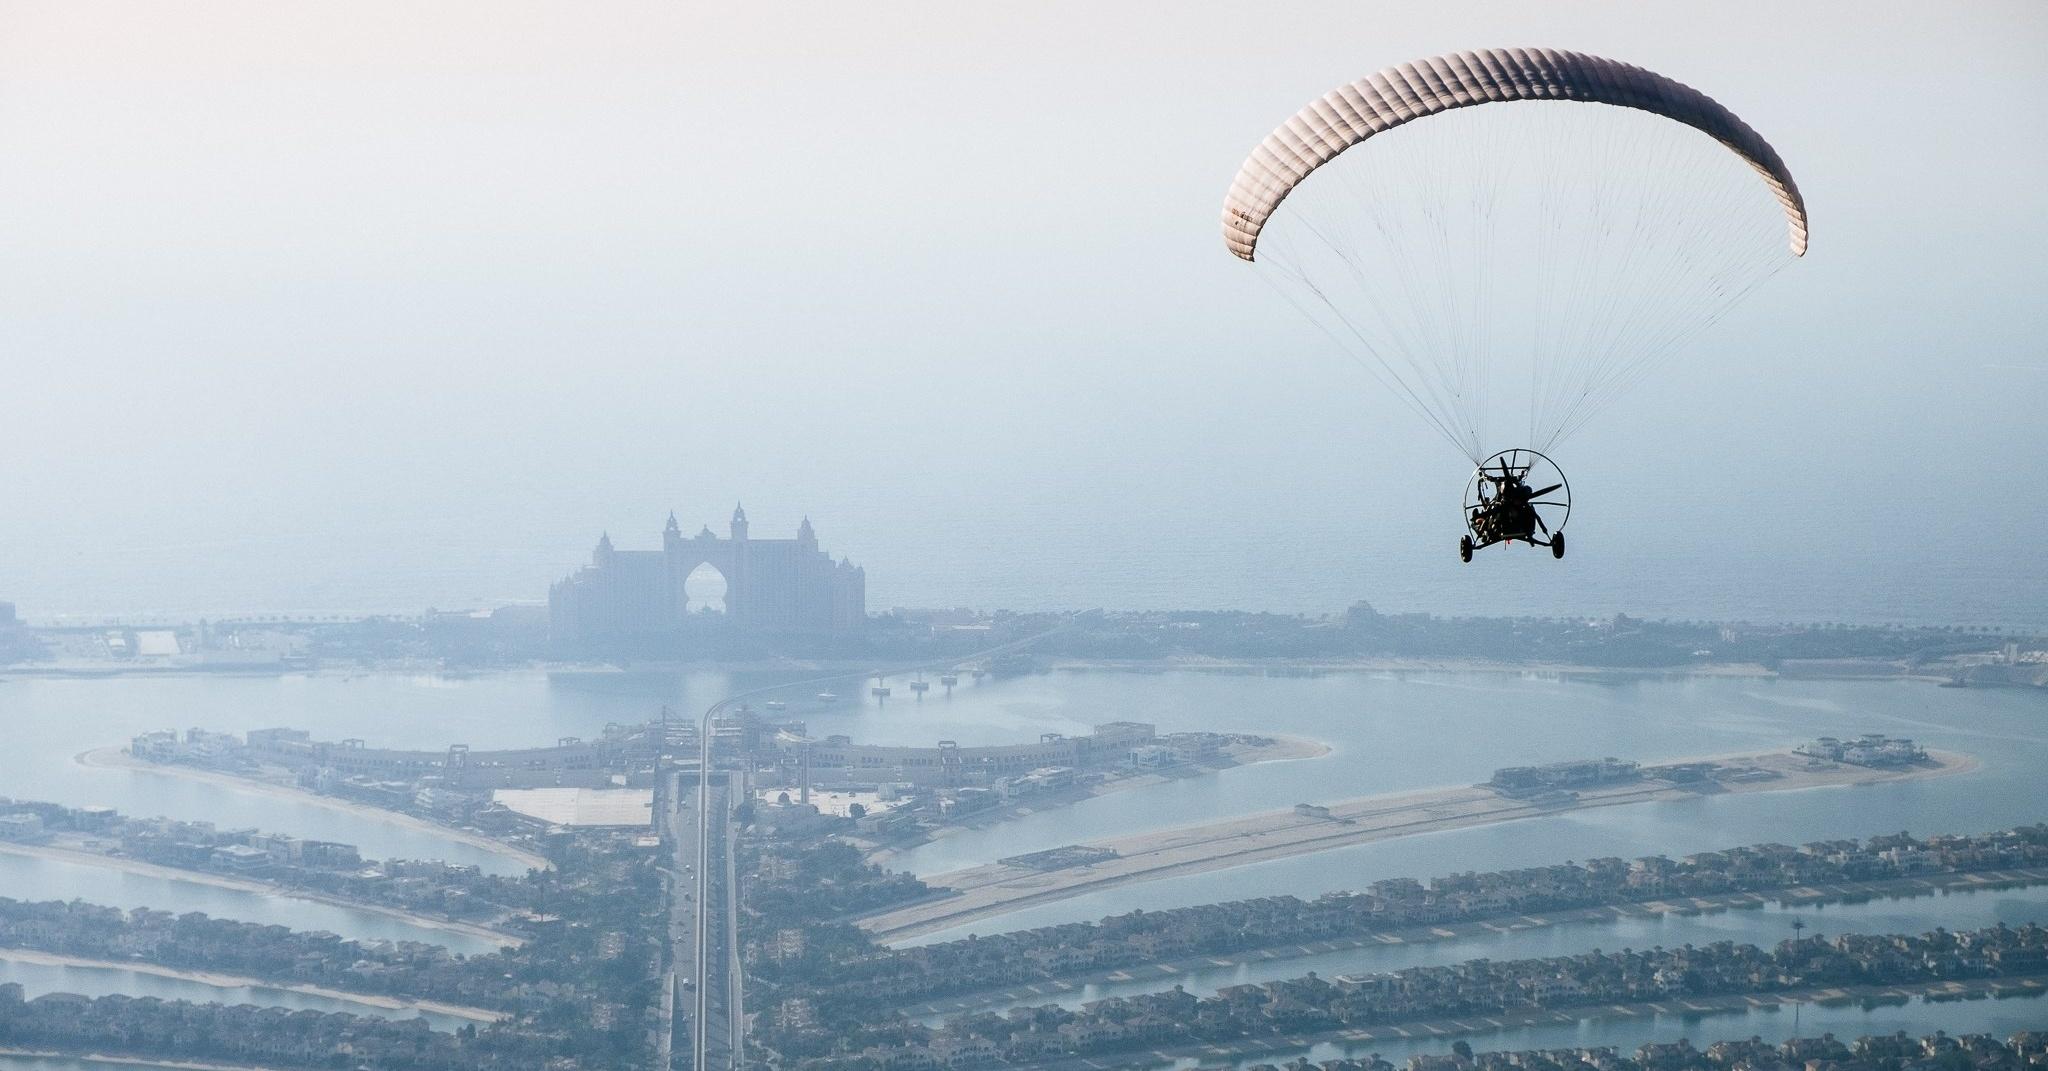 Skyhub paramotor tour in Dubai